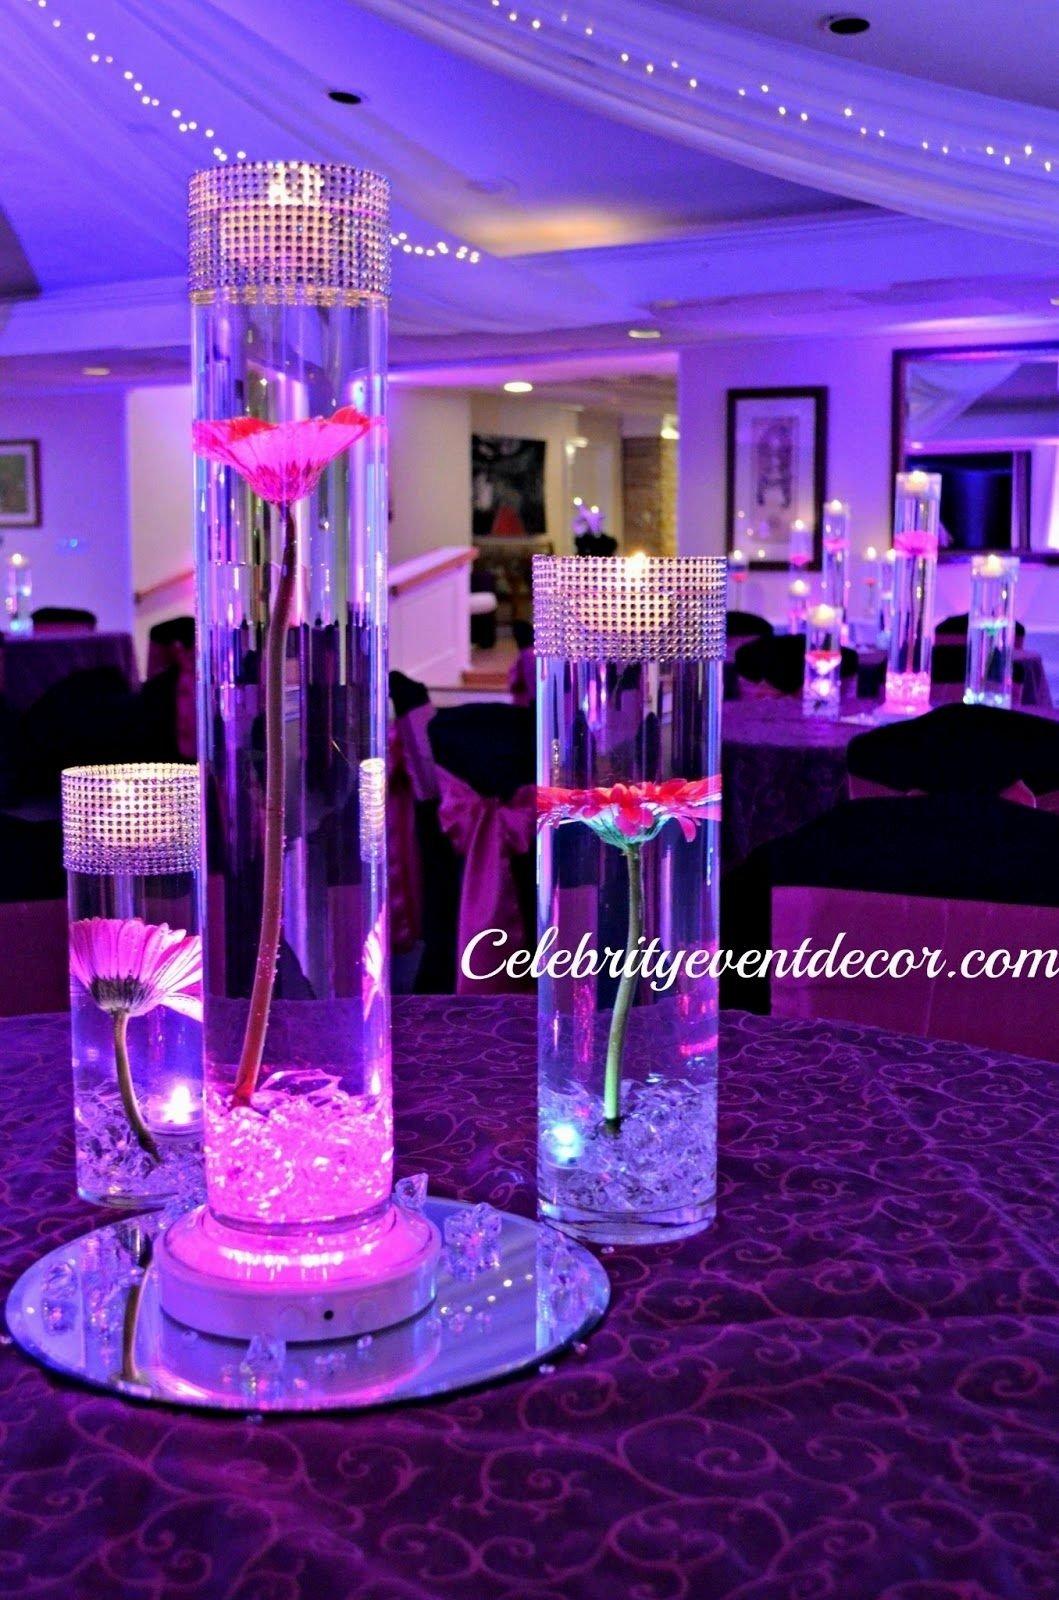 10 Stunning Sweet Sixteen Ideas No Party gorgeous 16th party decorations 1 sweet 16 140617 anadolukardiyolderg 2021